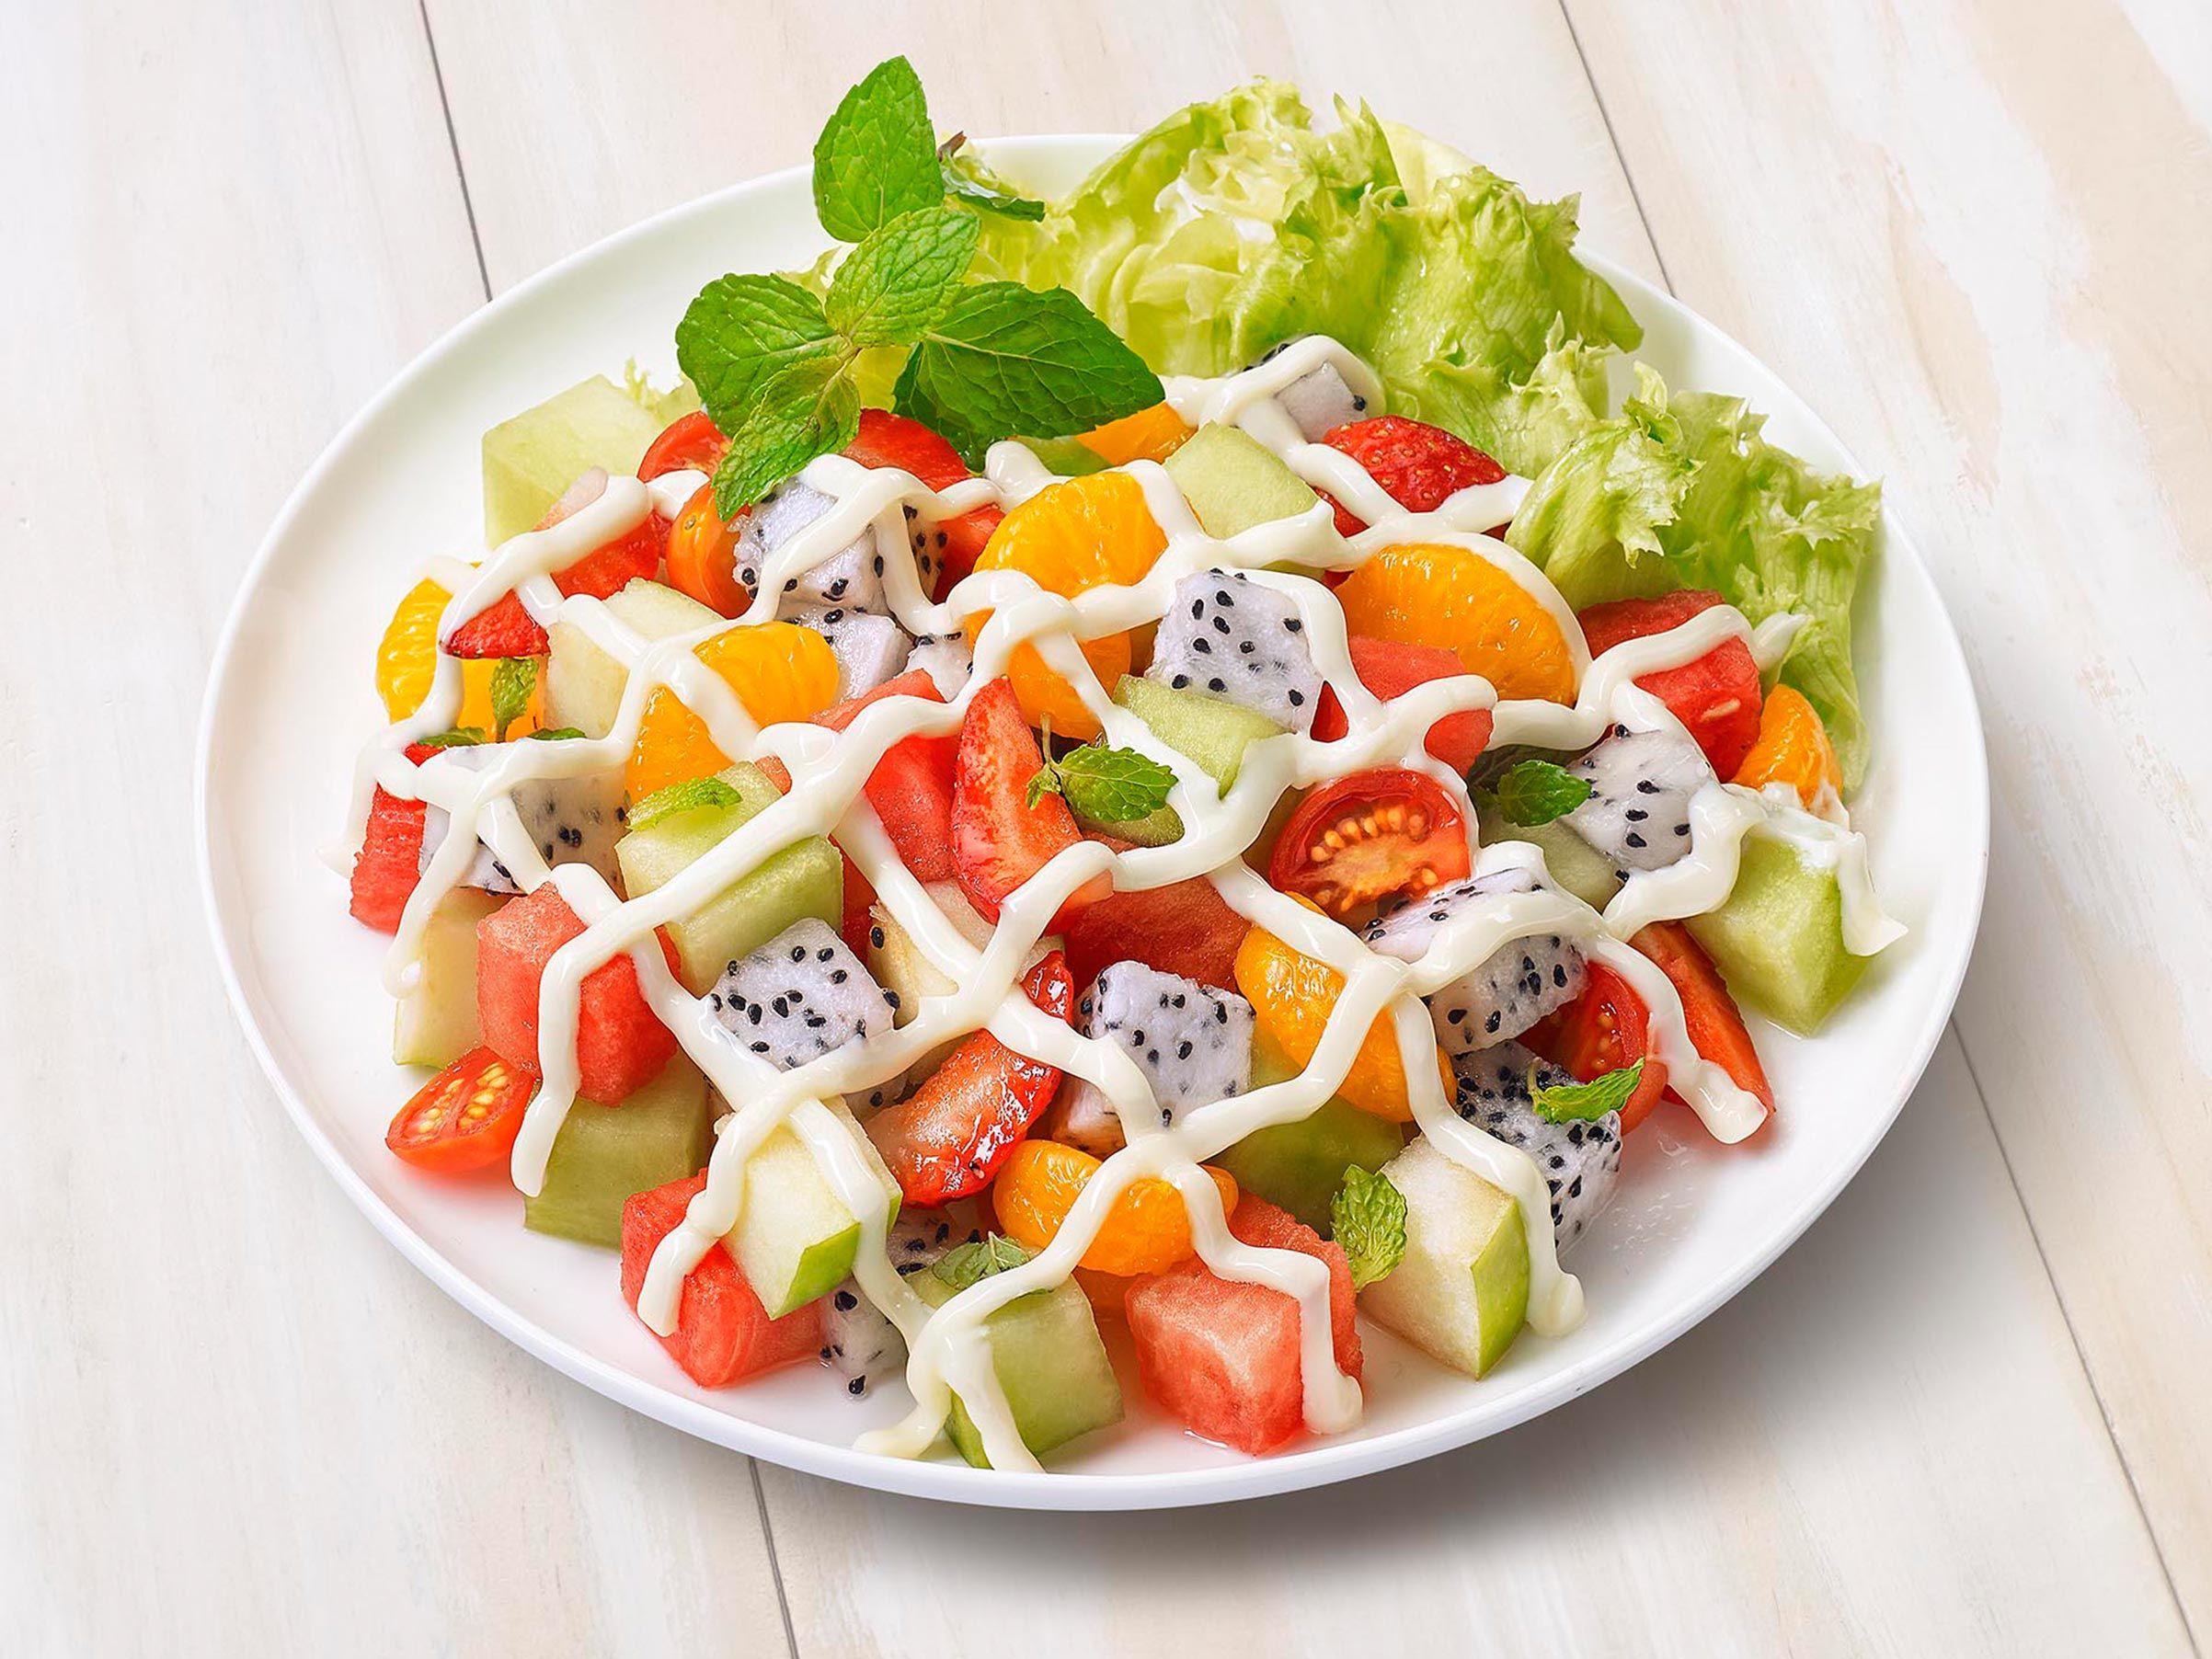 salad-sayur-dan-buah-hawagym-indonesia